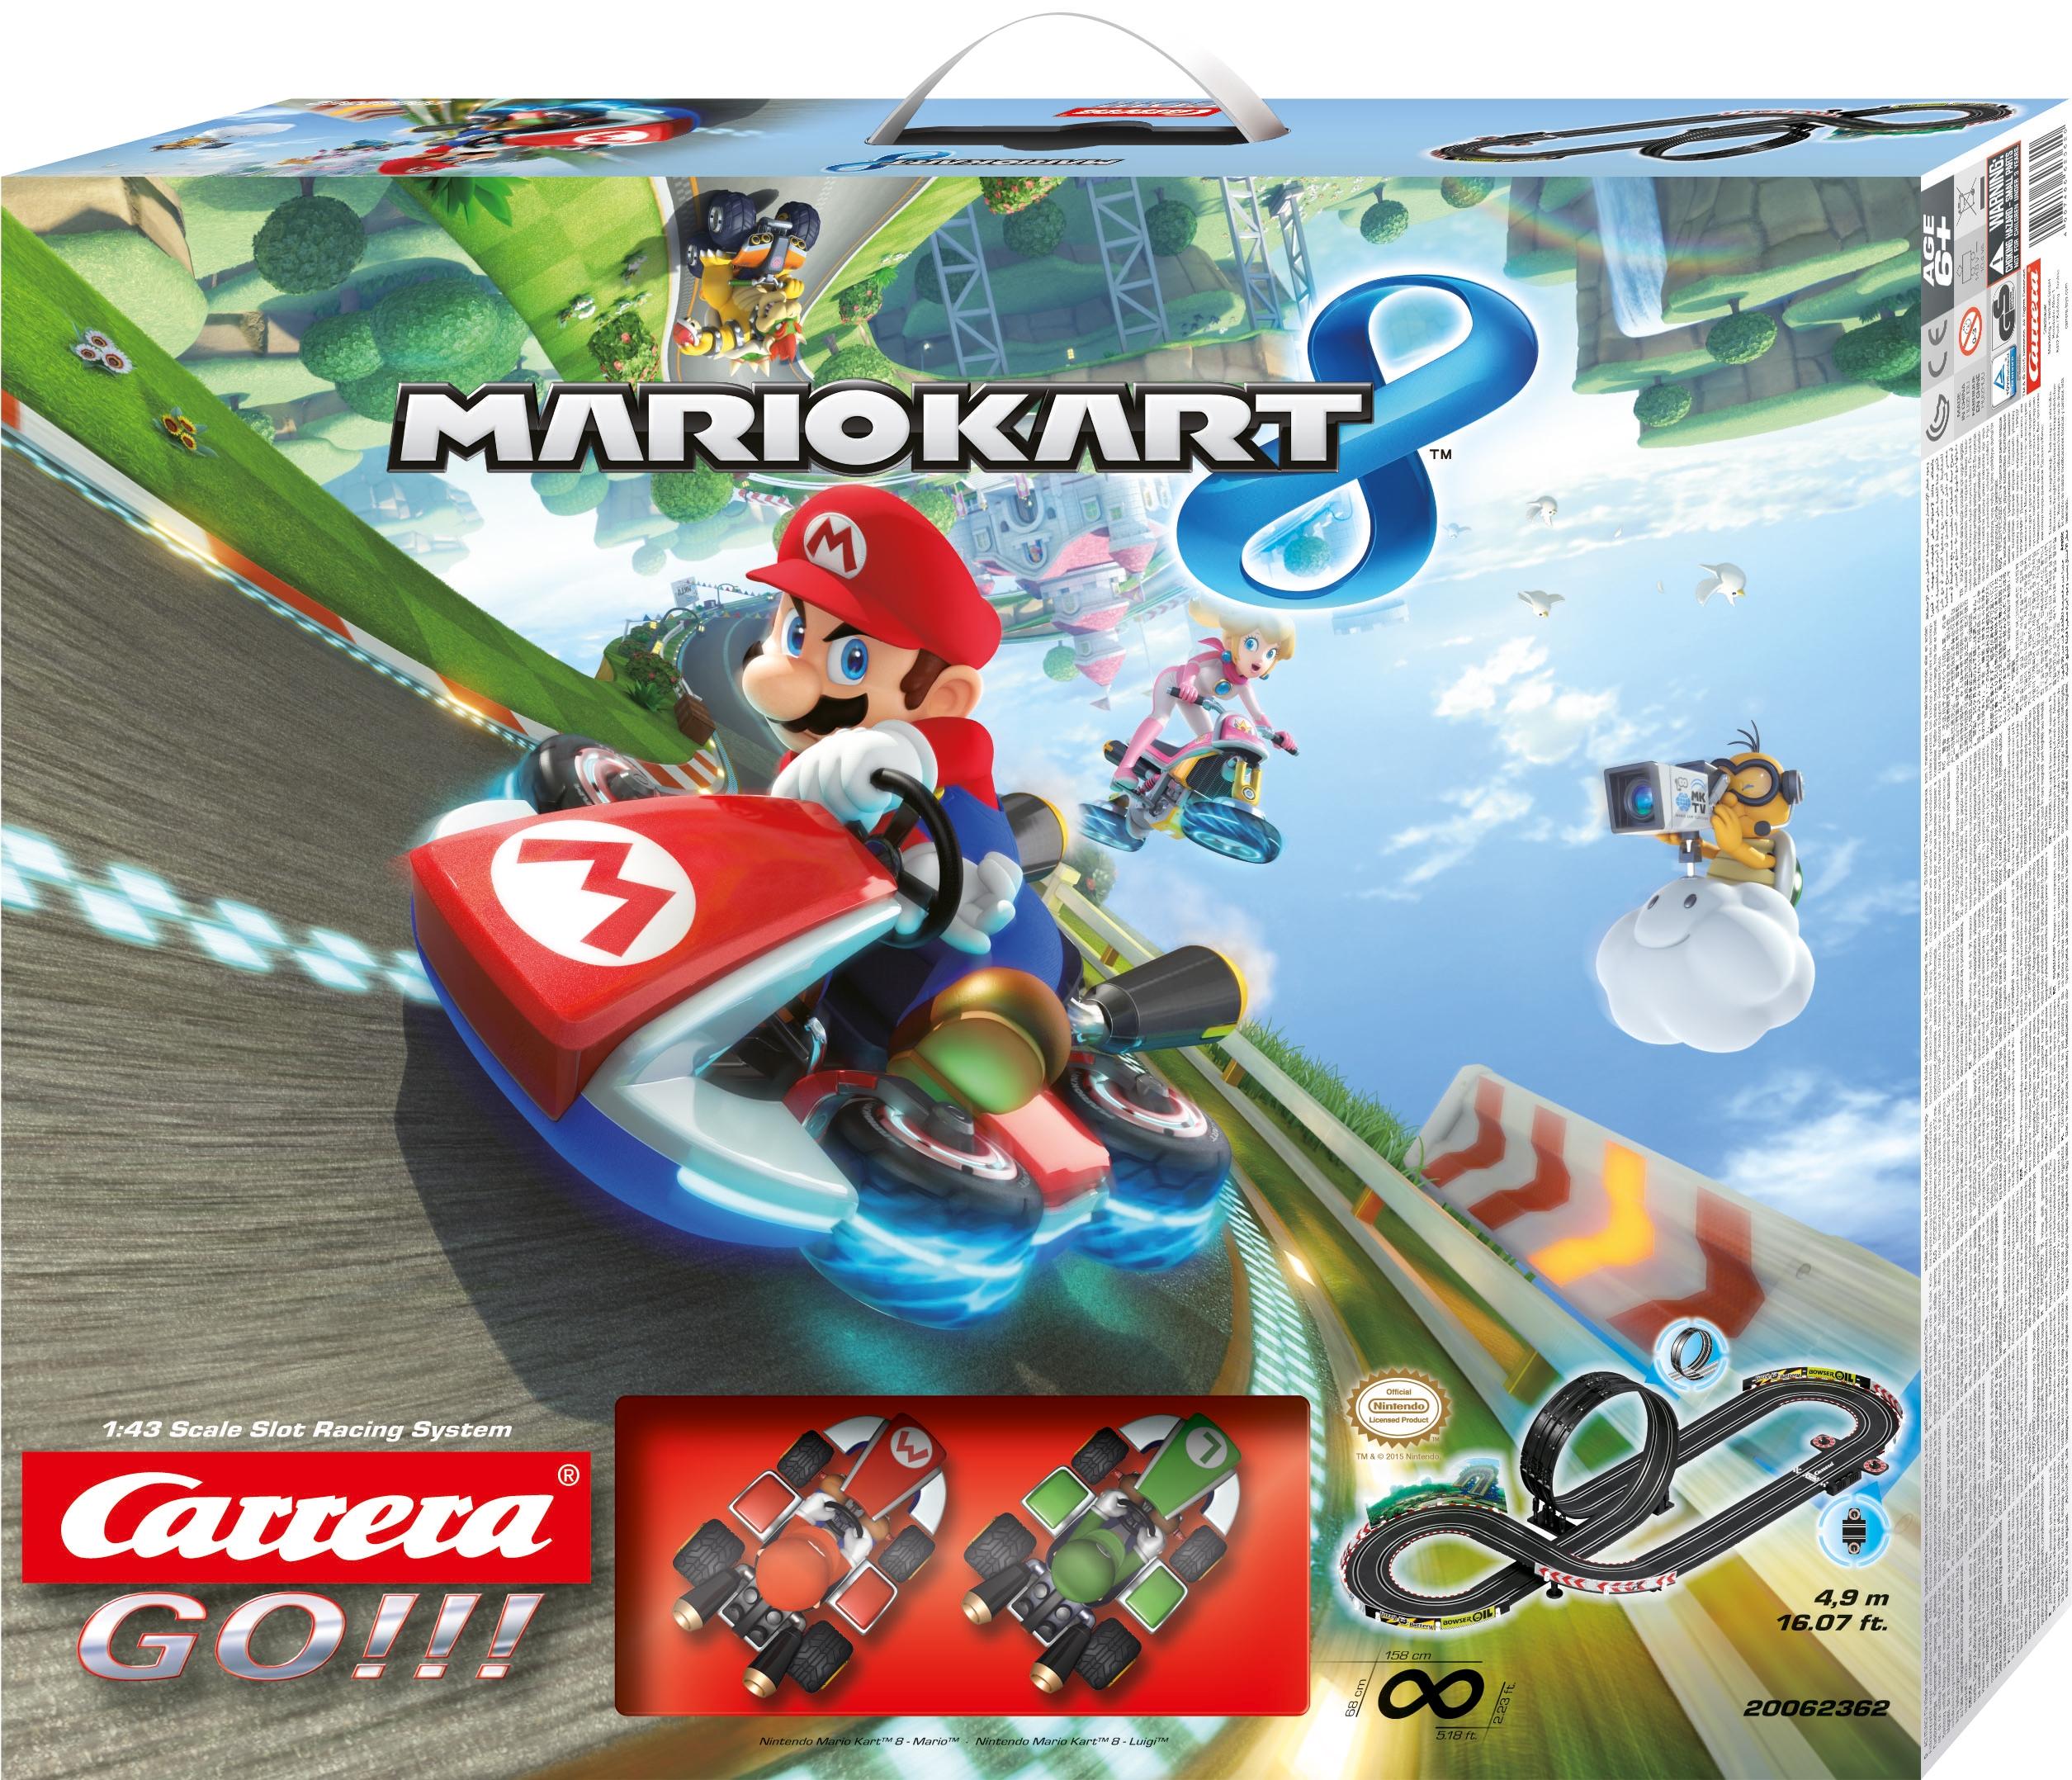 CARRERA GO!!! NINTENDO MARIO KART 8  cod. 20062362